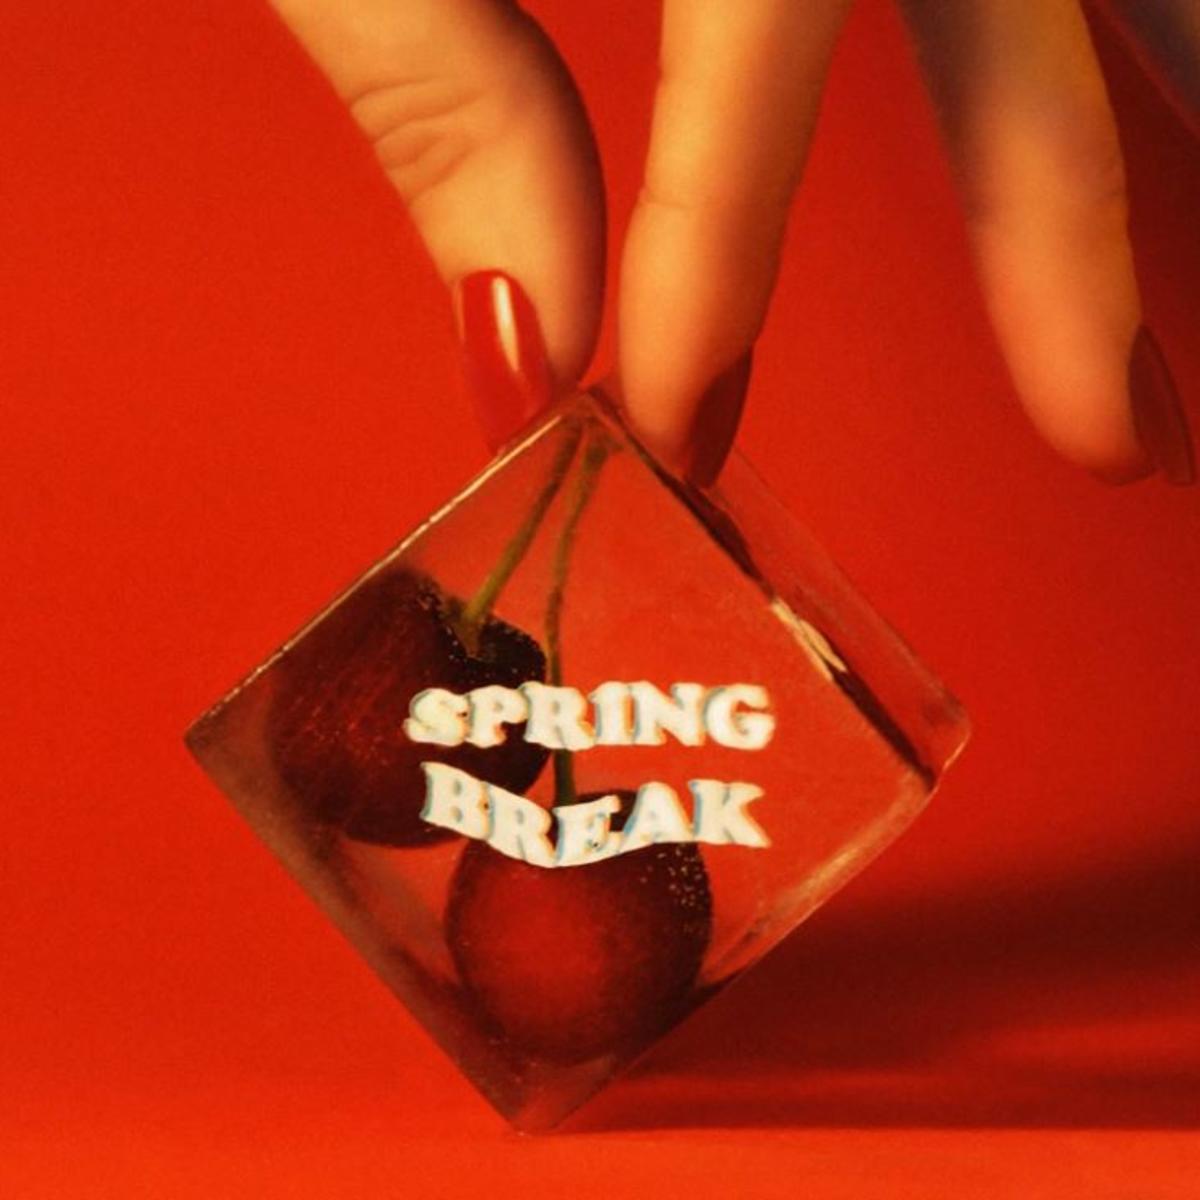 AJ Mitchell Feat. Rich The Kid - Spring Break